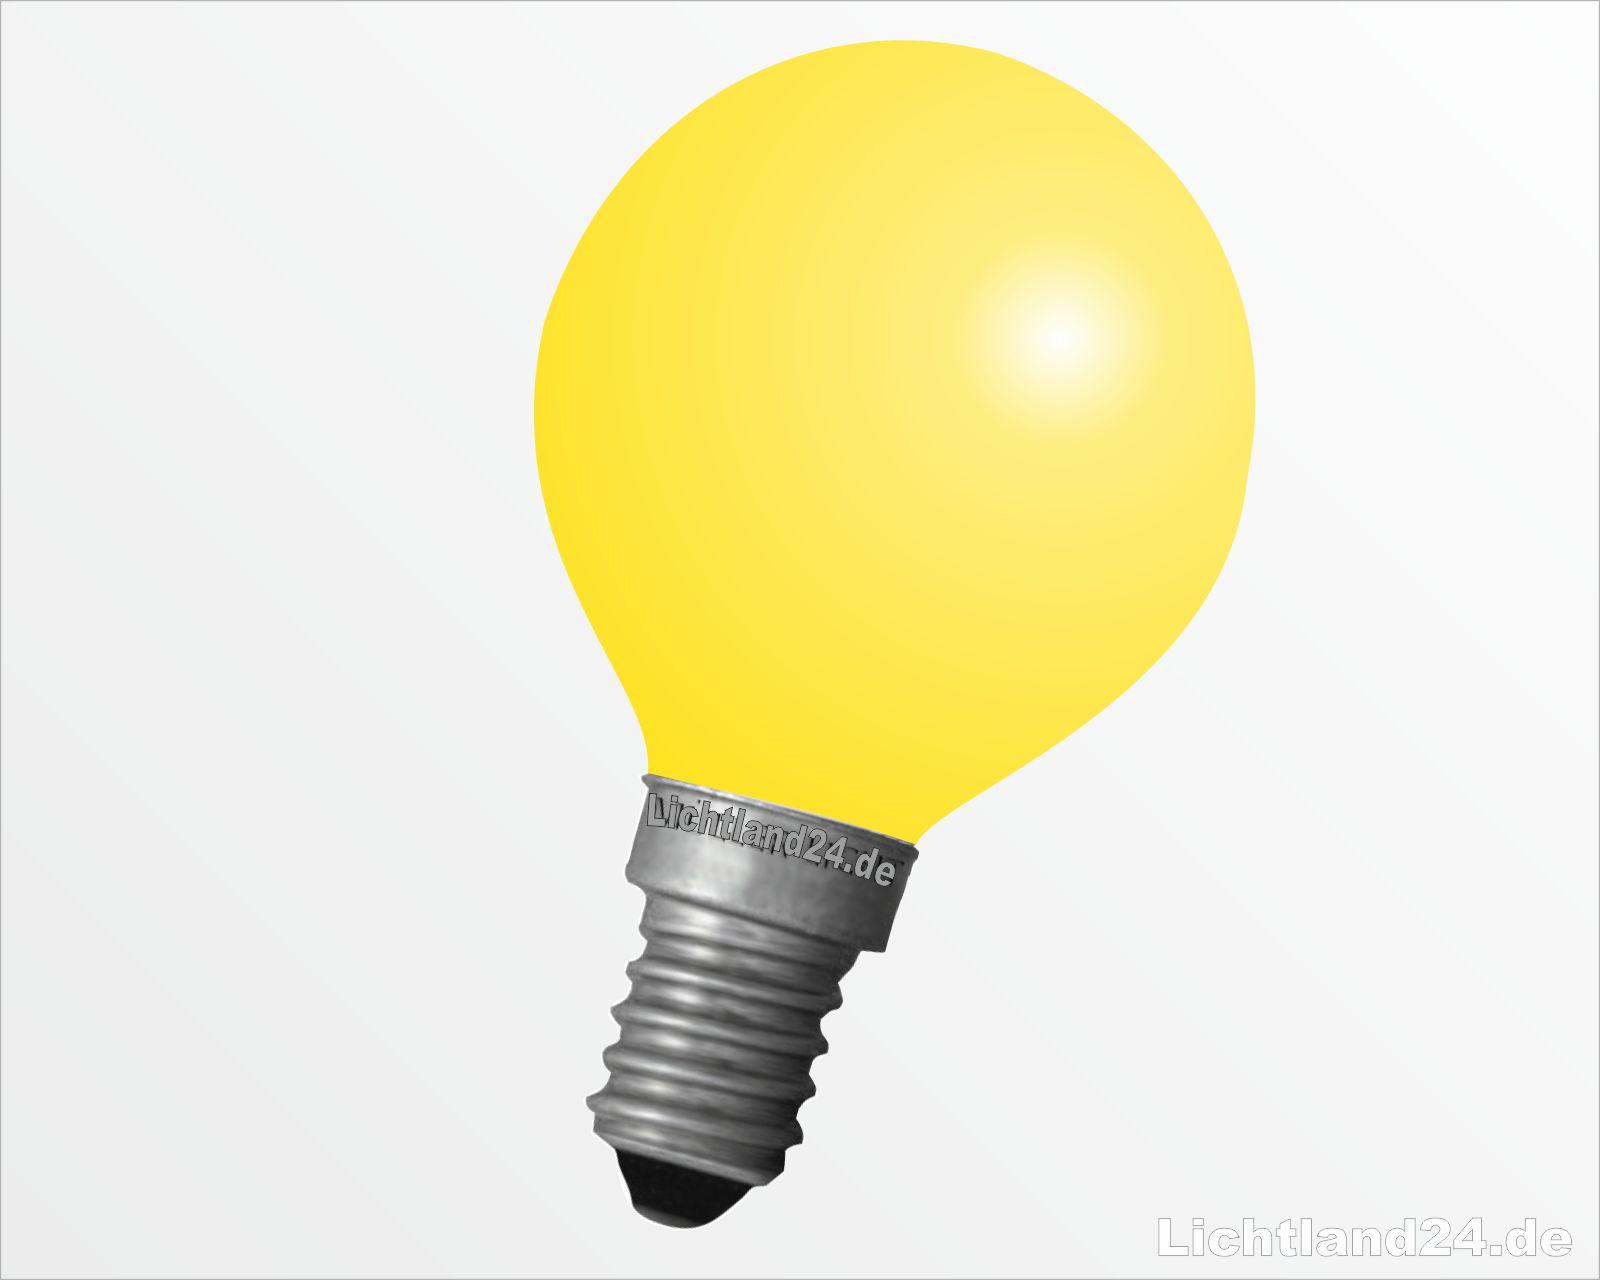 e14 tropfen gl hbirne 25 watt gelb farbige gl hbirnen bunte gl hlampen 25w ebay. Black Bedroom Furniture Sets. Home Design Ideas